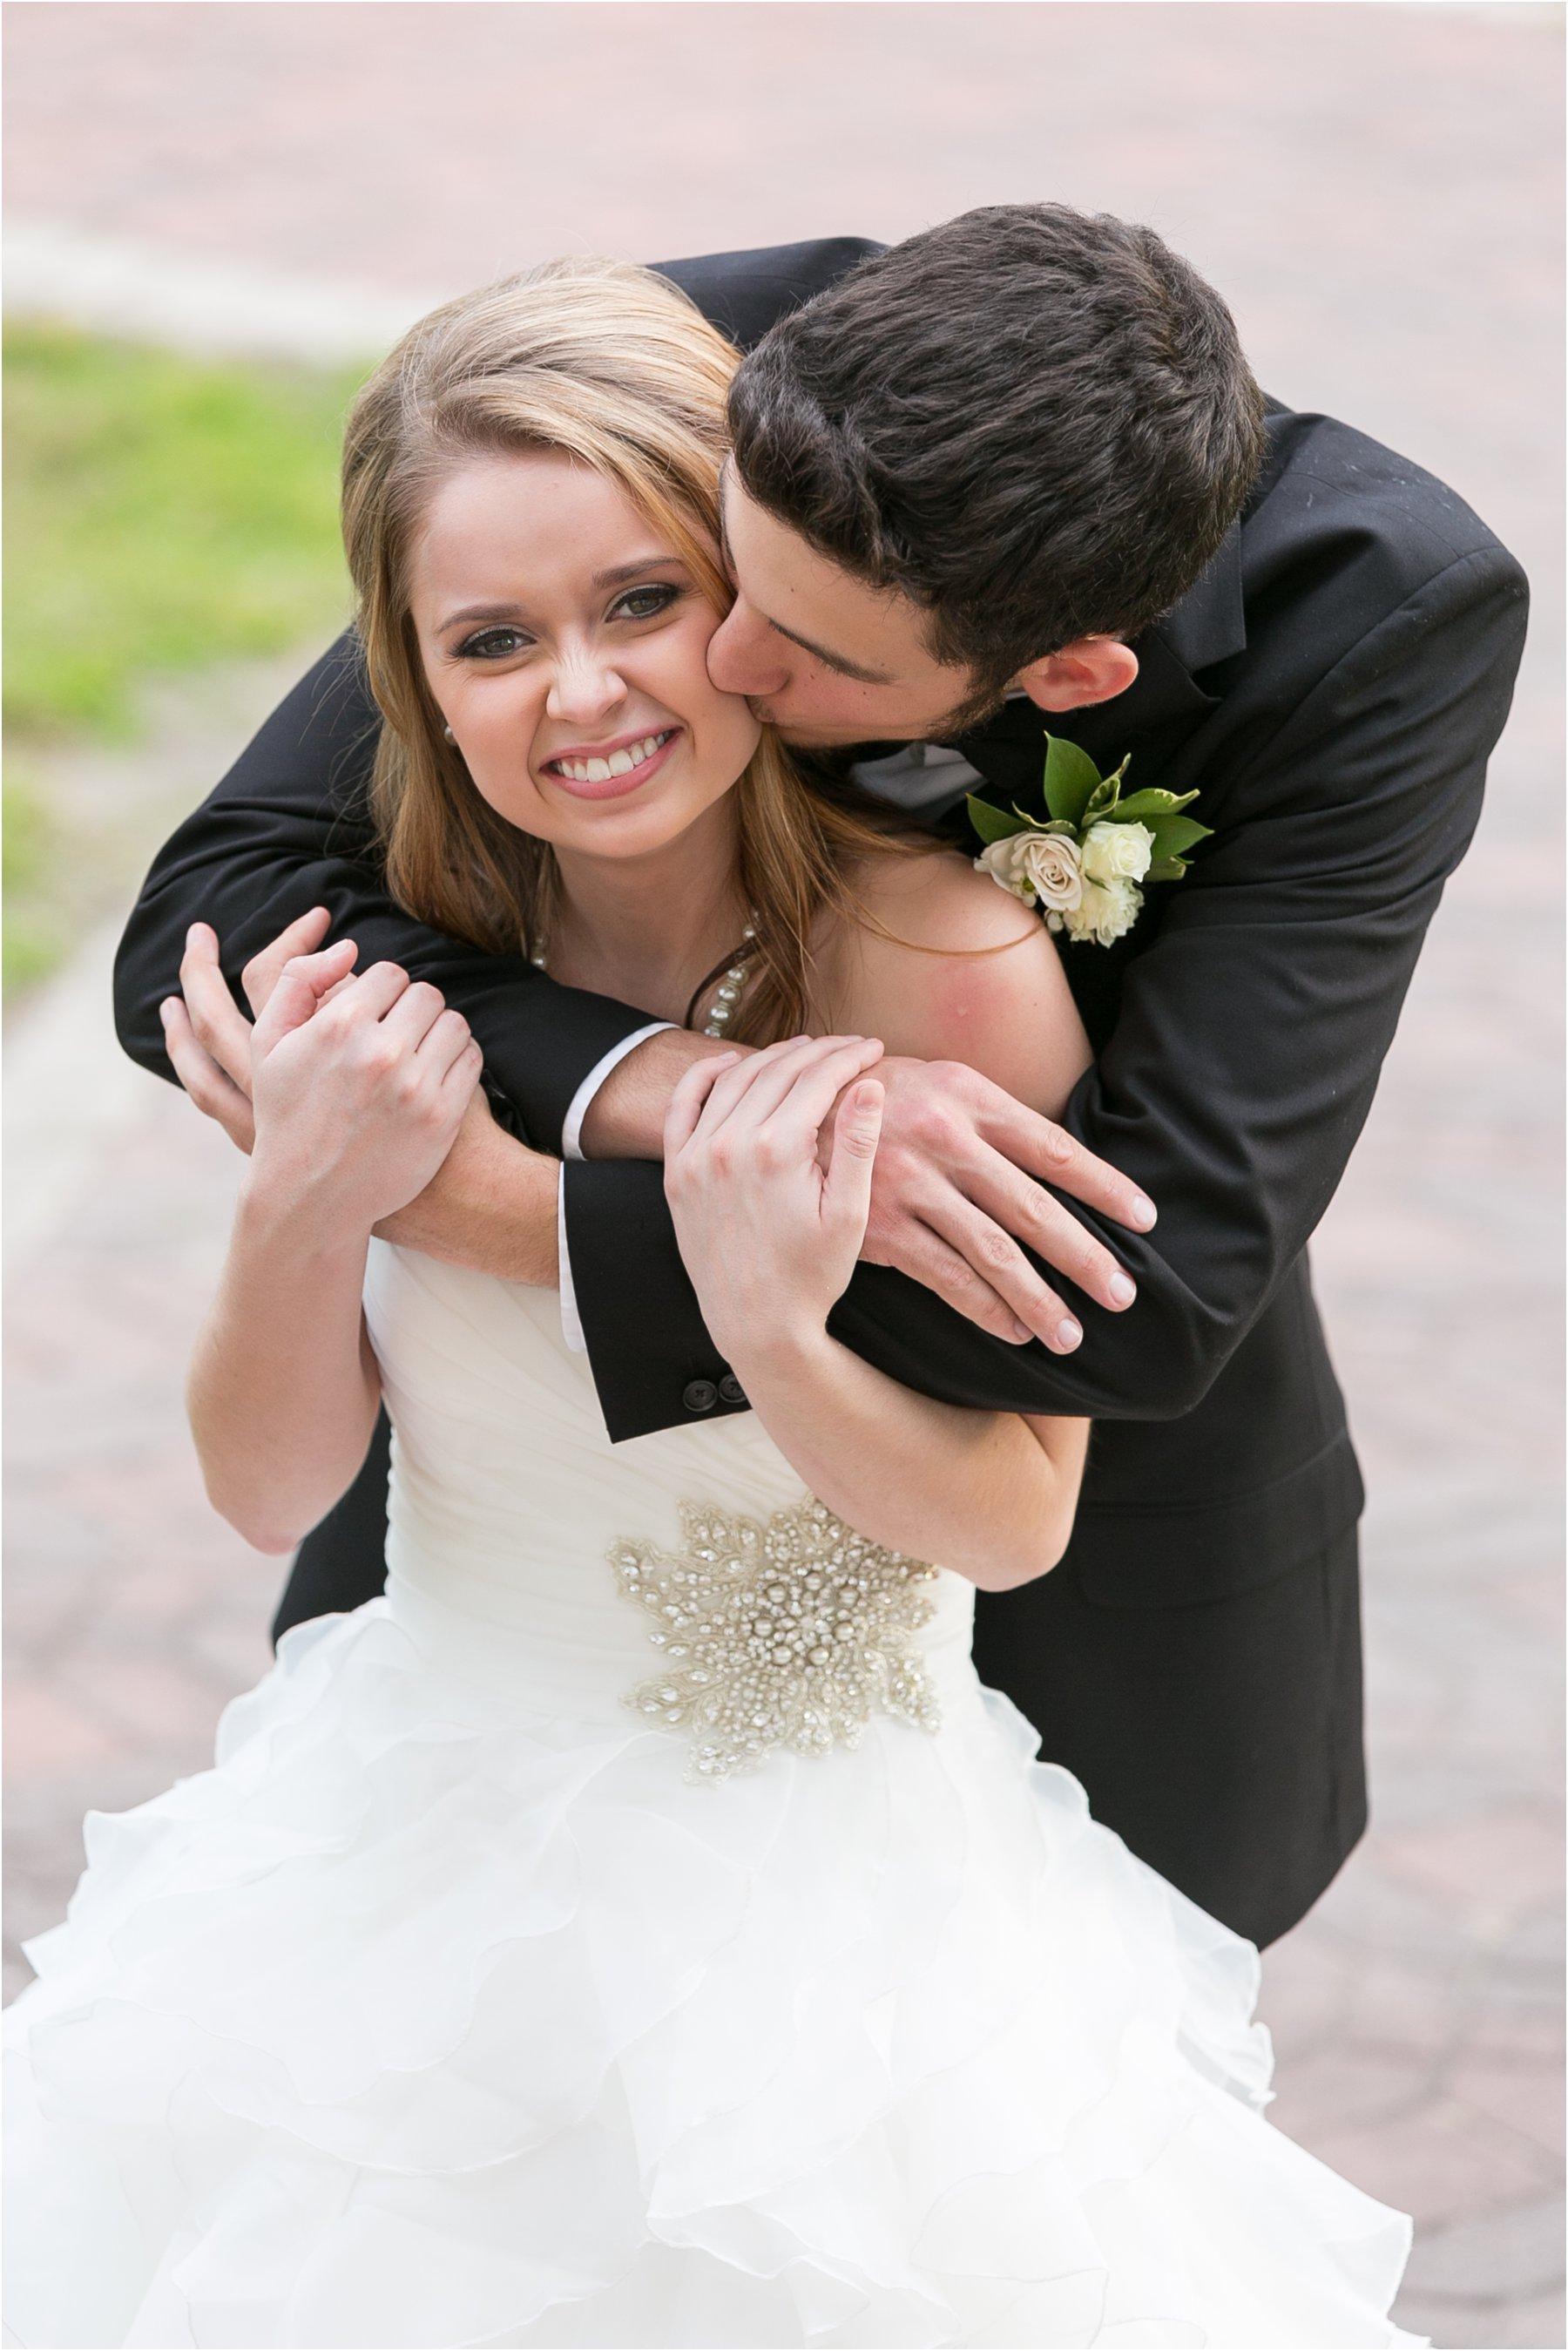 Holly_Ridge_Manor_Wedding_Photography_Jessica_Ryan_Photography_virginia_virginia_beach_0269